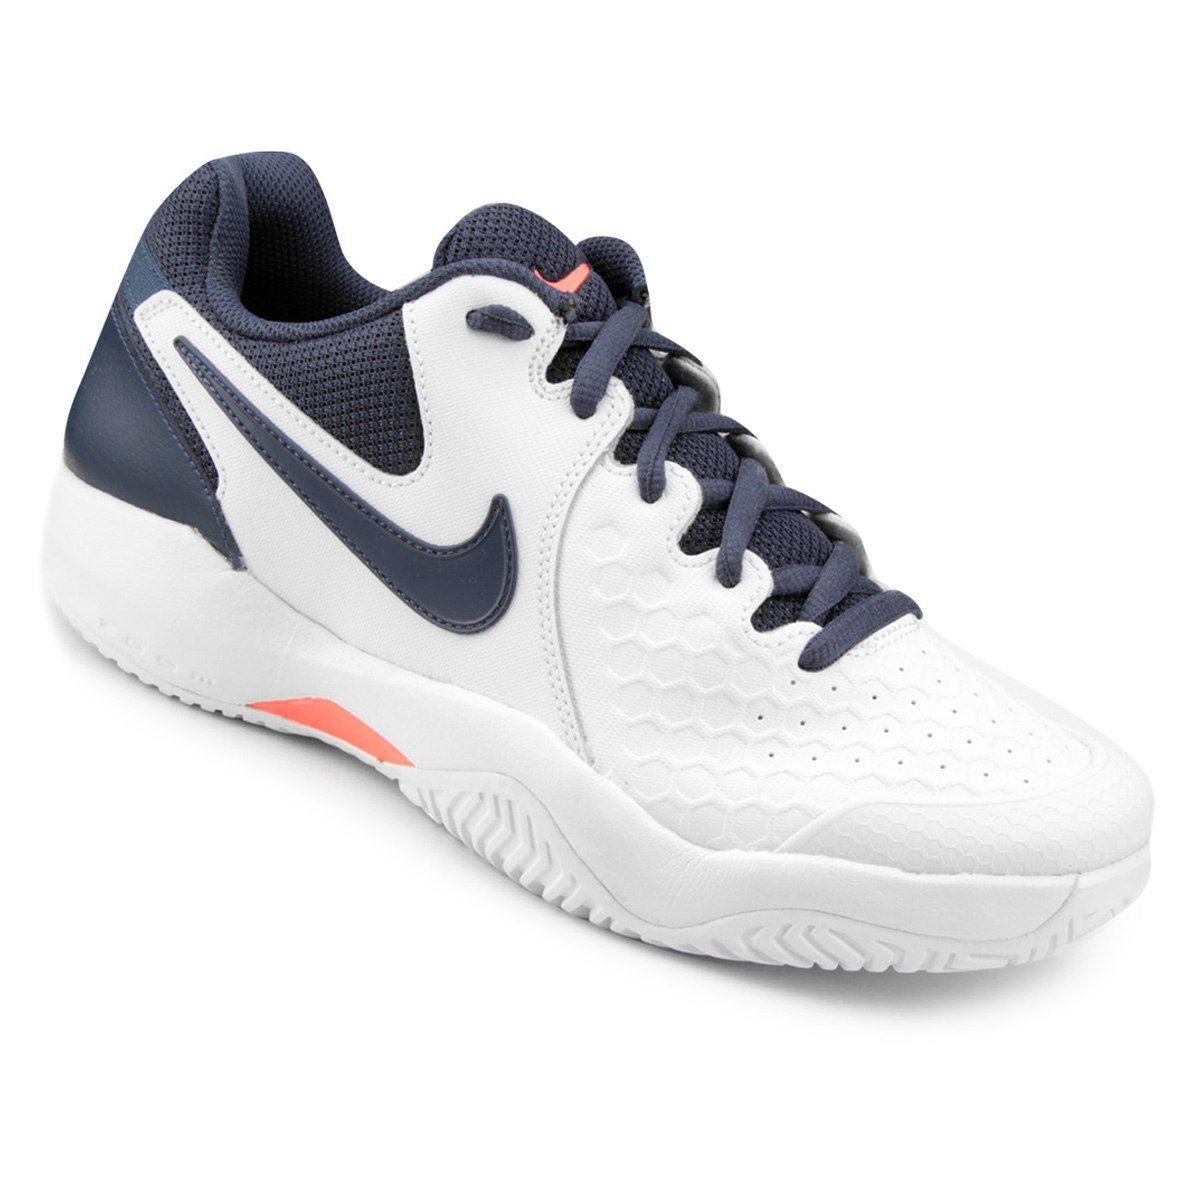 d95fe6e51609e Tênis Couro Nike Air Zoom Resistance Masculino - Branco e Azul ...